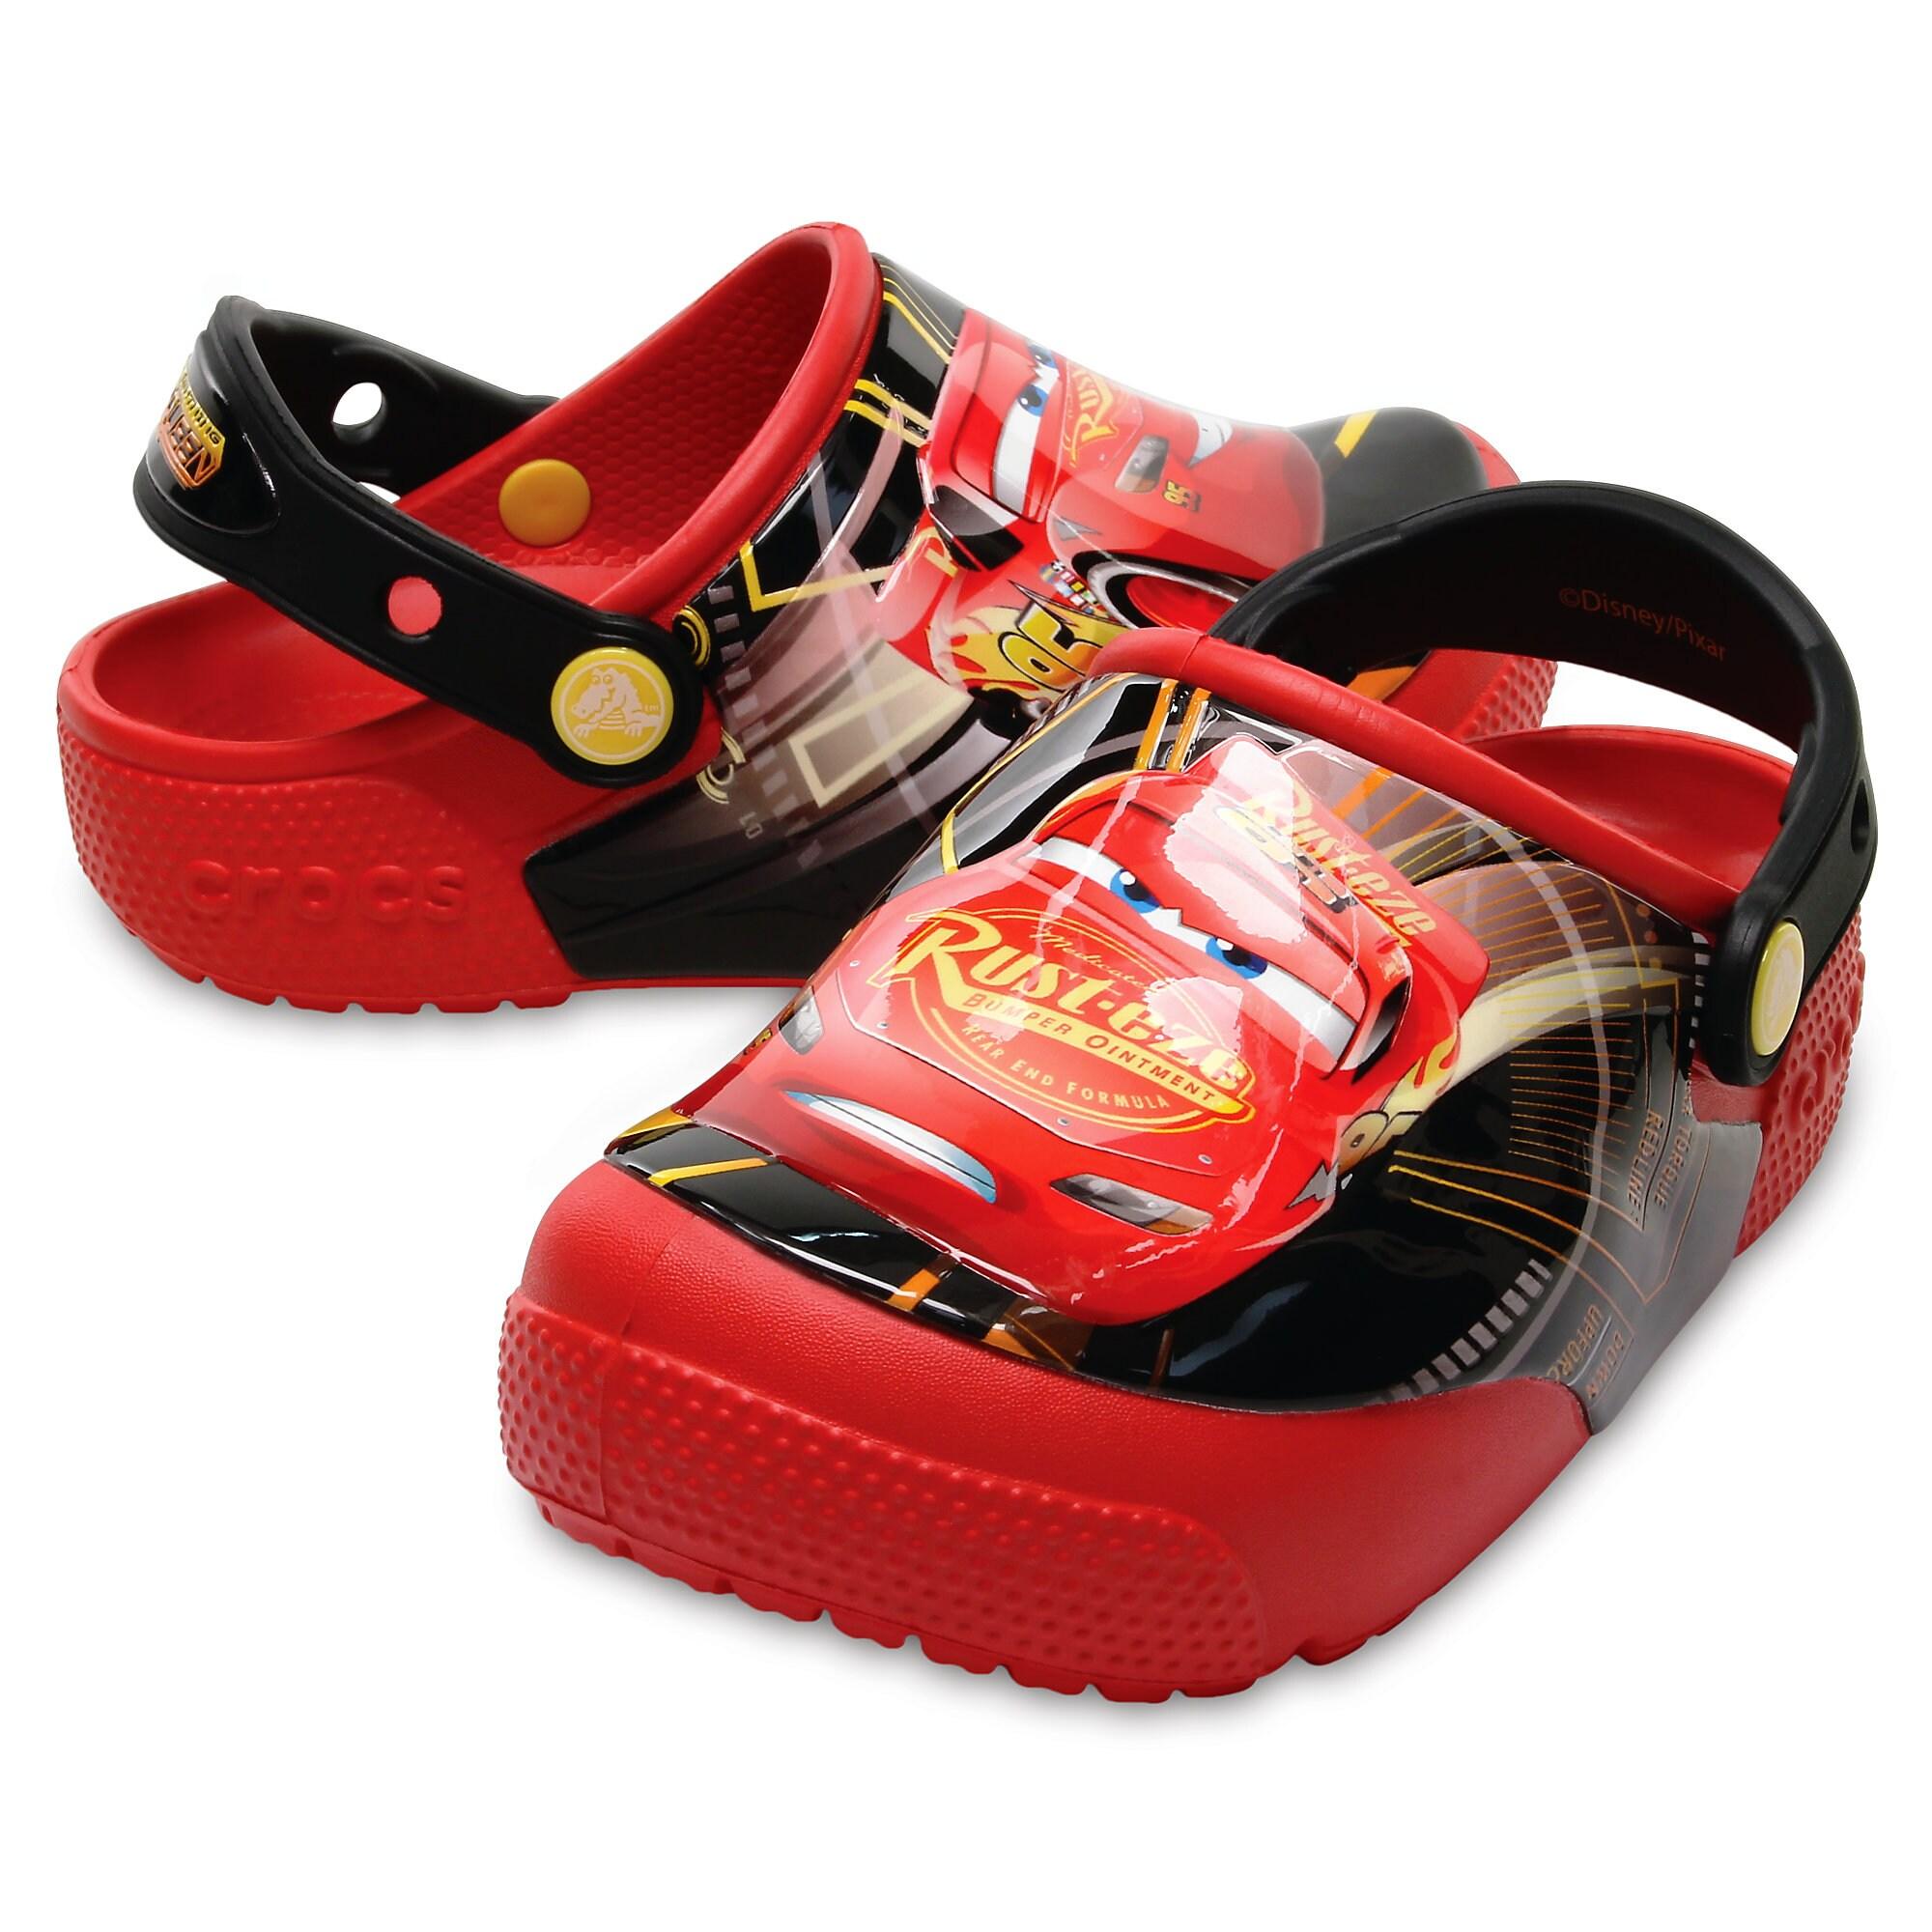 Lightning McQueen Crocs™ Light-Up Clogs for Boys  sc 1 st  shopDisney & Lightning McQueen Crocs™ Light-Up Clogs for Boys | shopDisney azcodes.com